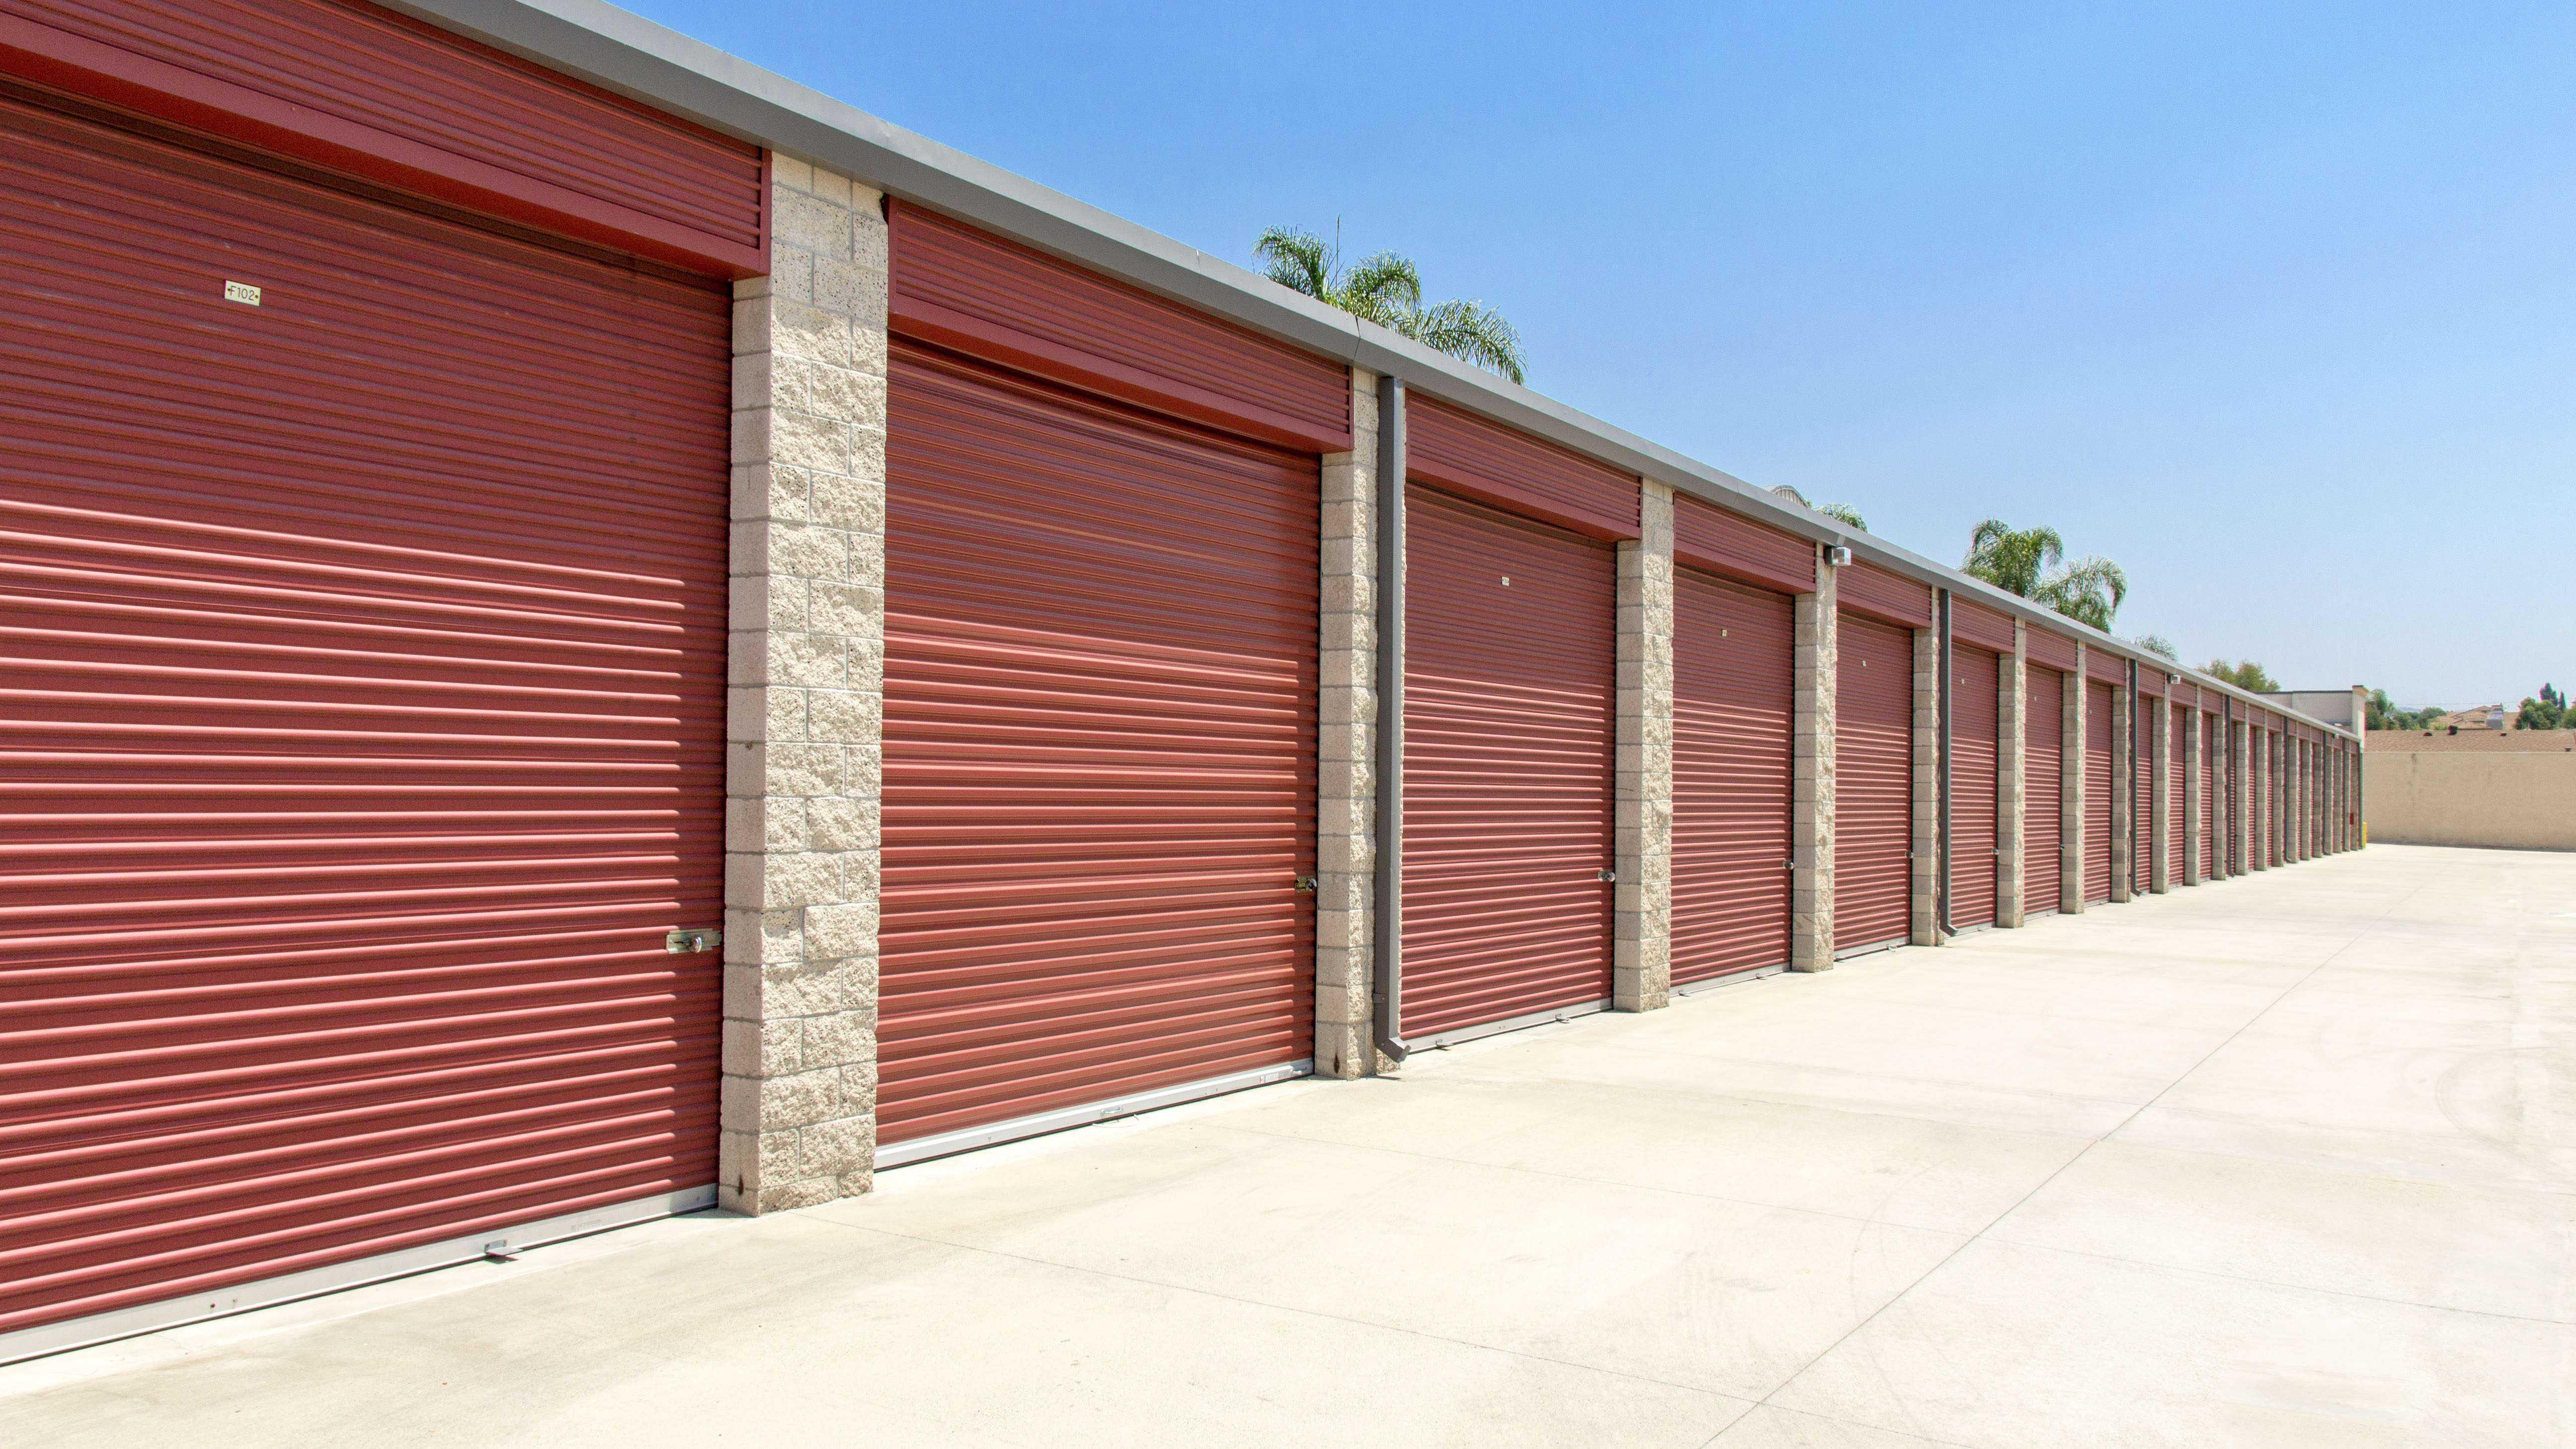 50 Off Storage Units In Yorba Linda Ca Instorage Self